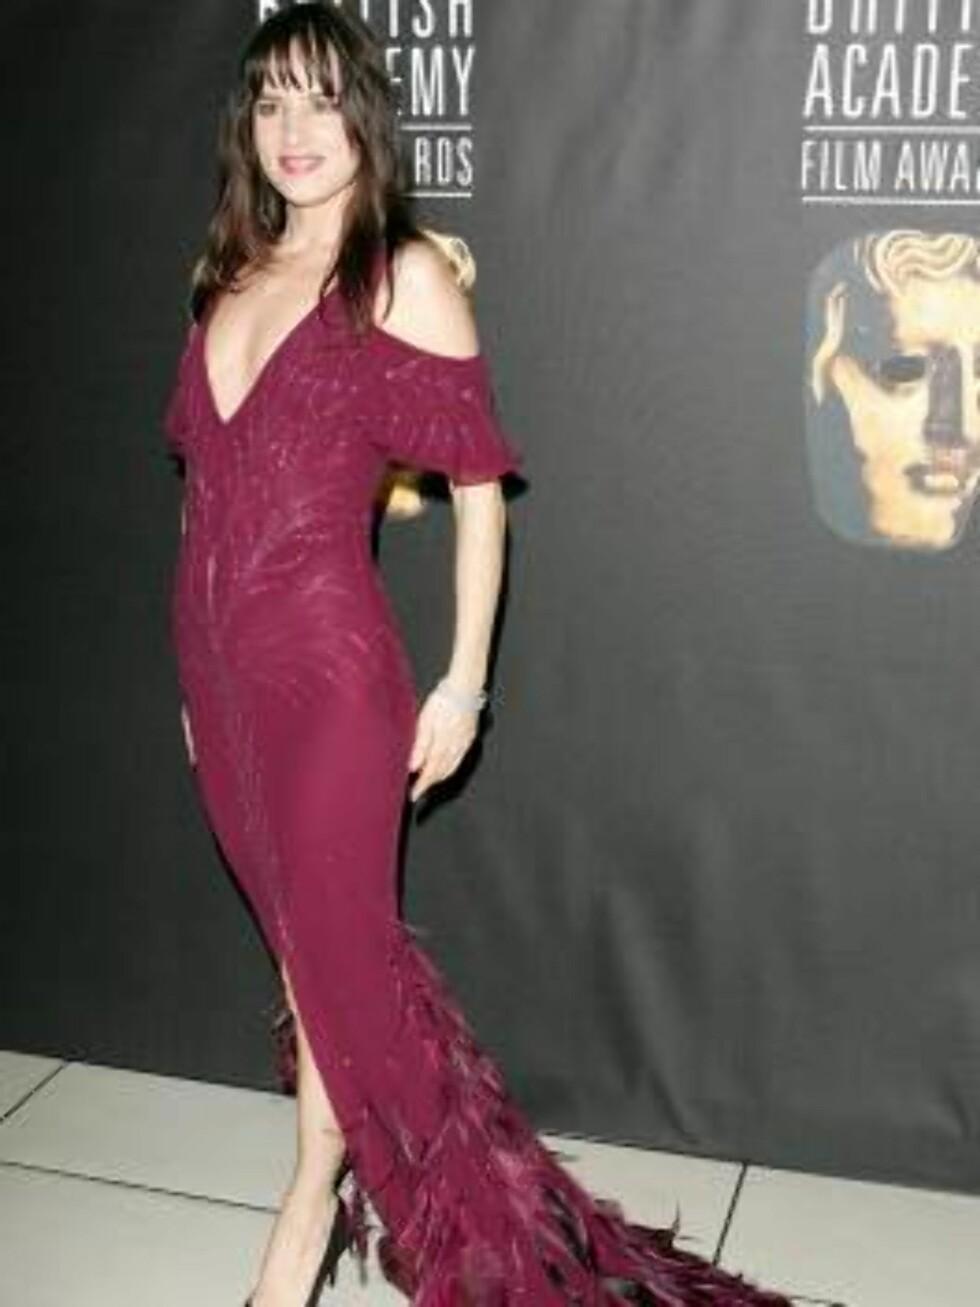 OSCAR-NOMINERT: Juliette Lewis ble Oscar-nominert for rollen hun hadde i filmen «Cape Fear» i 1991.  Foto: All Over Press